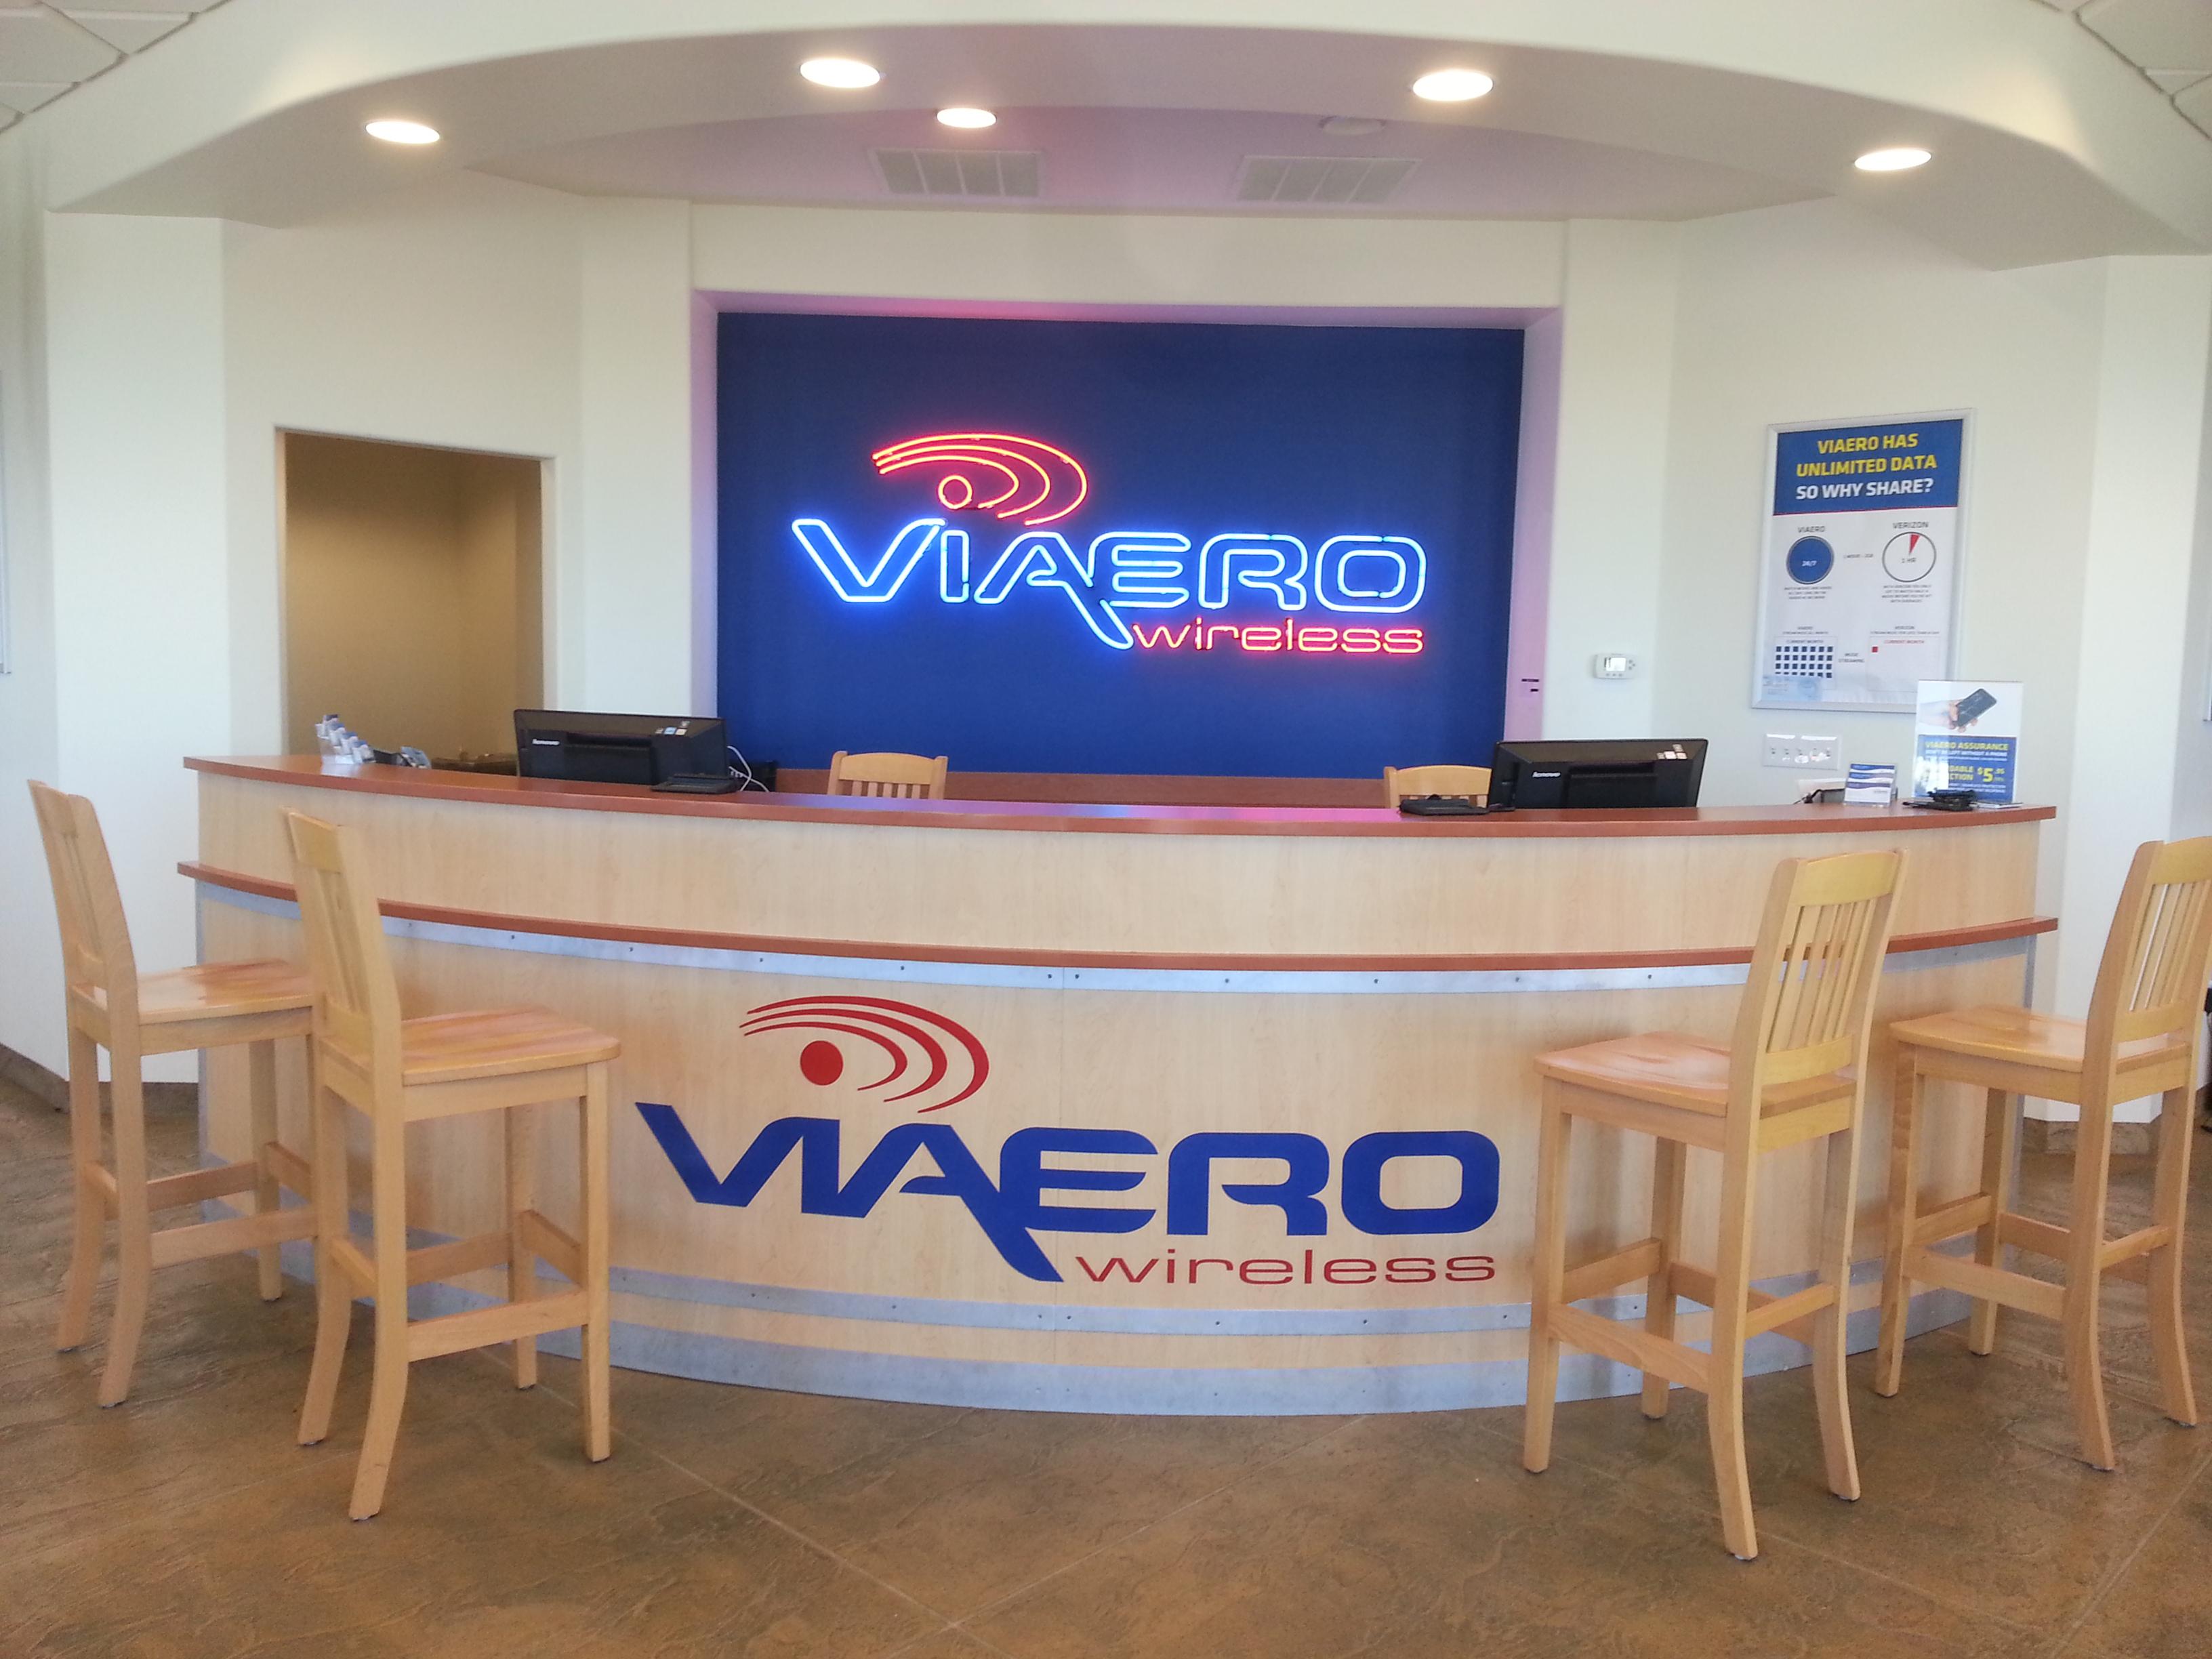 Viaero Wireless image 1